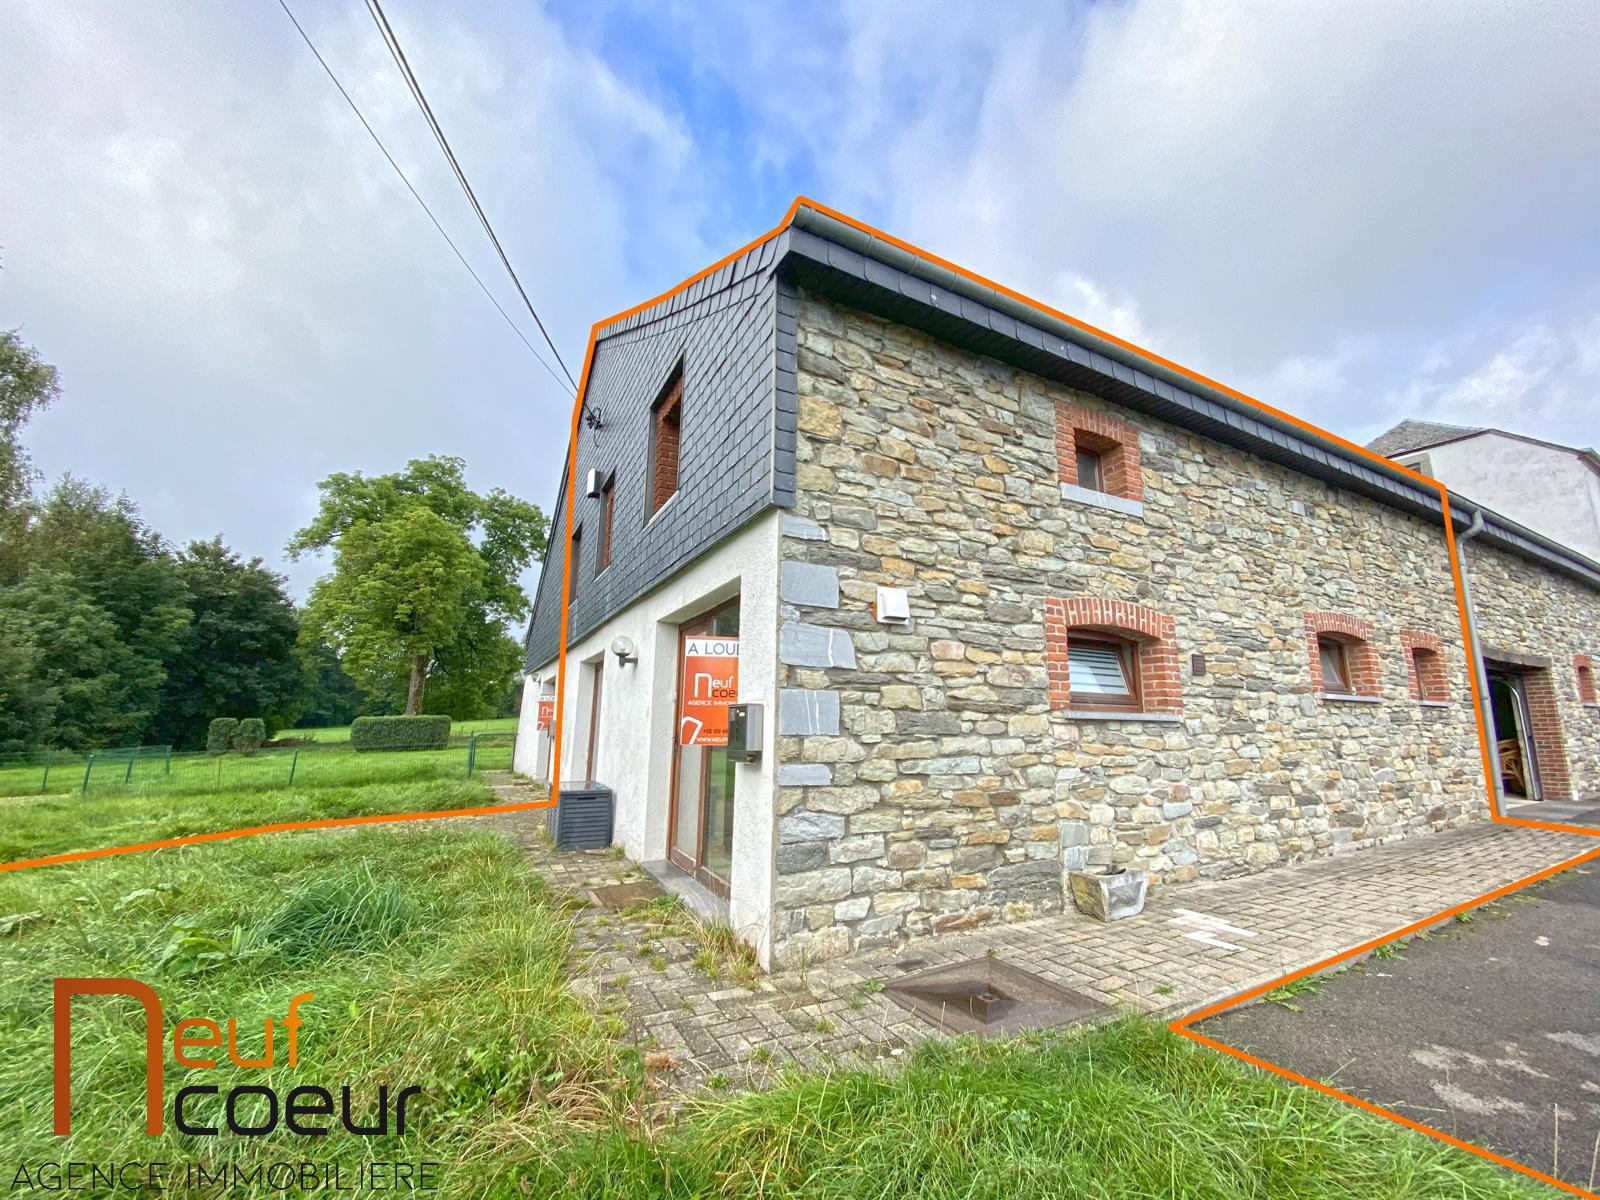 Maison - Libramont-Chevigny - #4508306-0